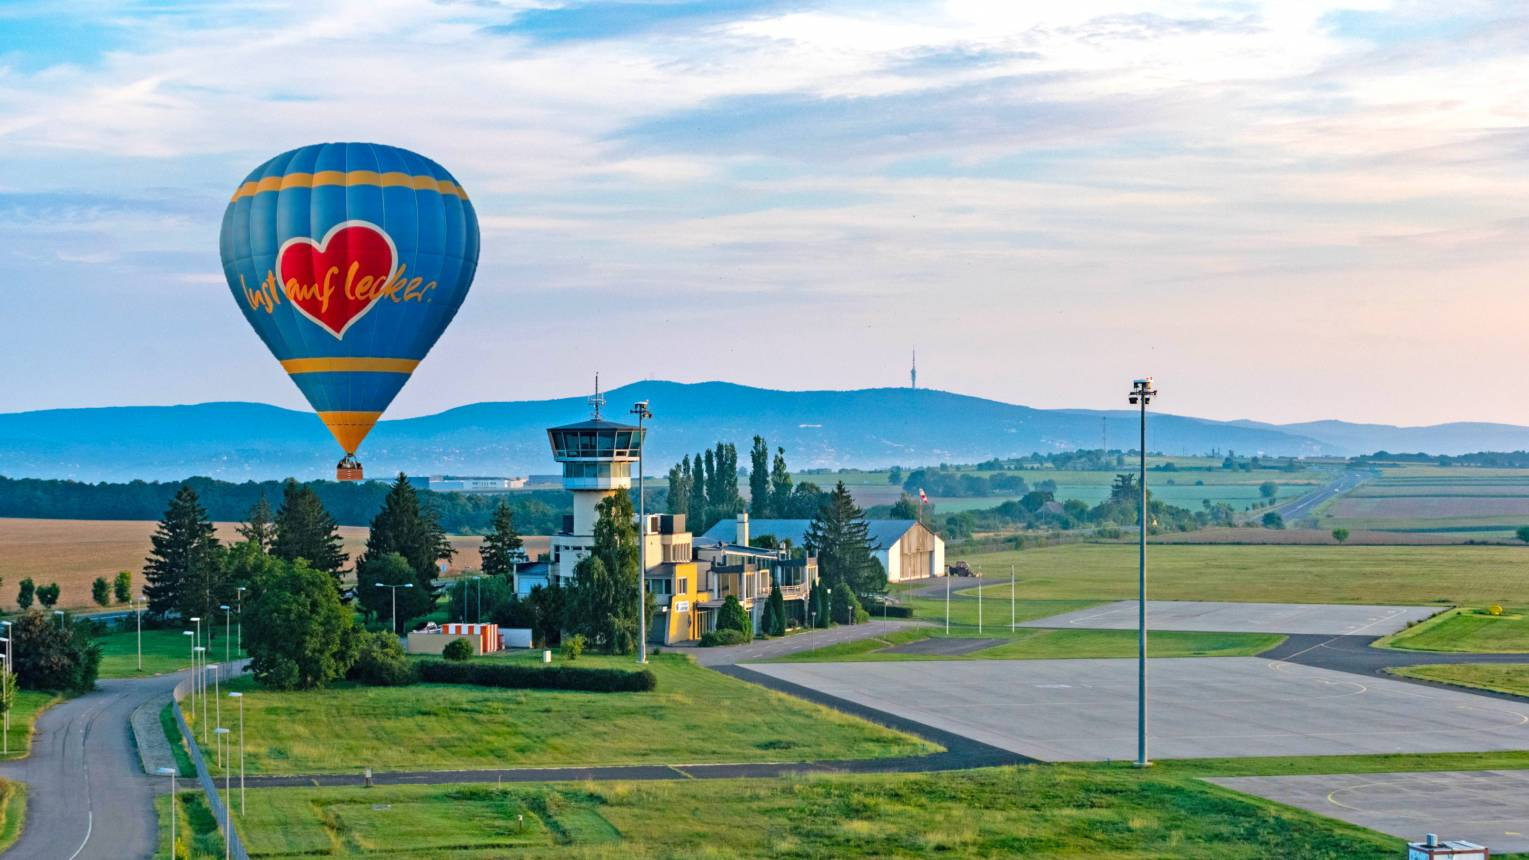 Suhanj hőlégballonnal Pécs felett